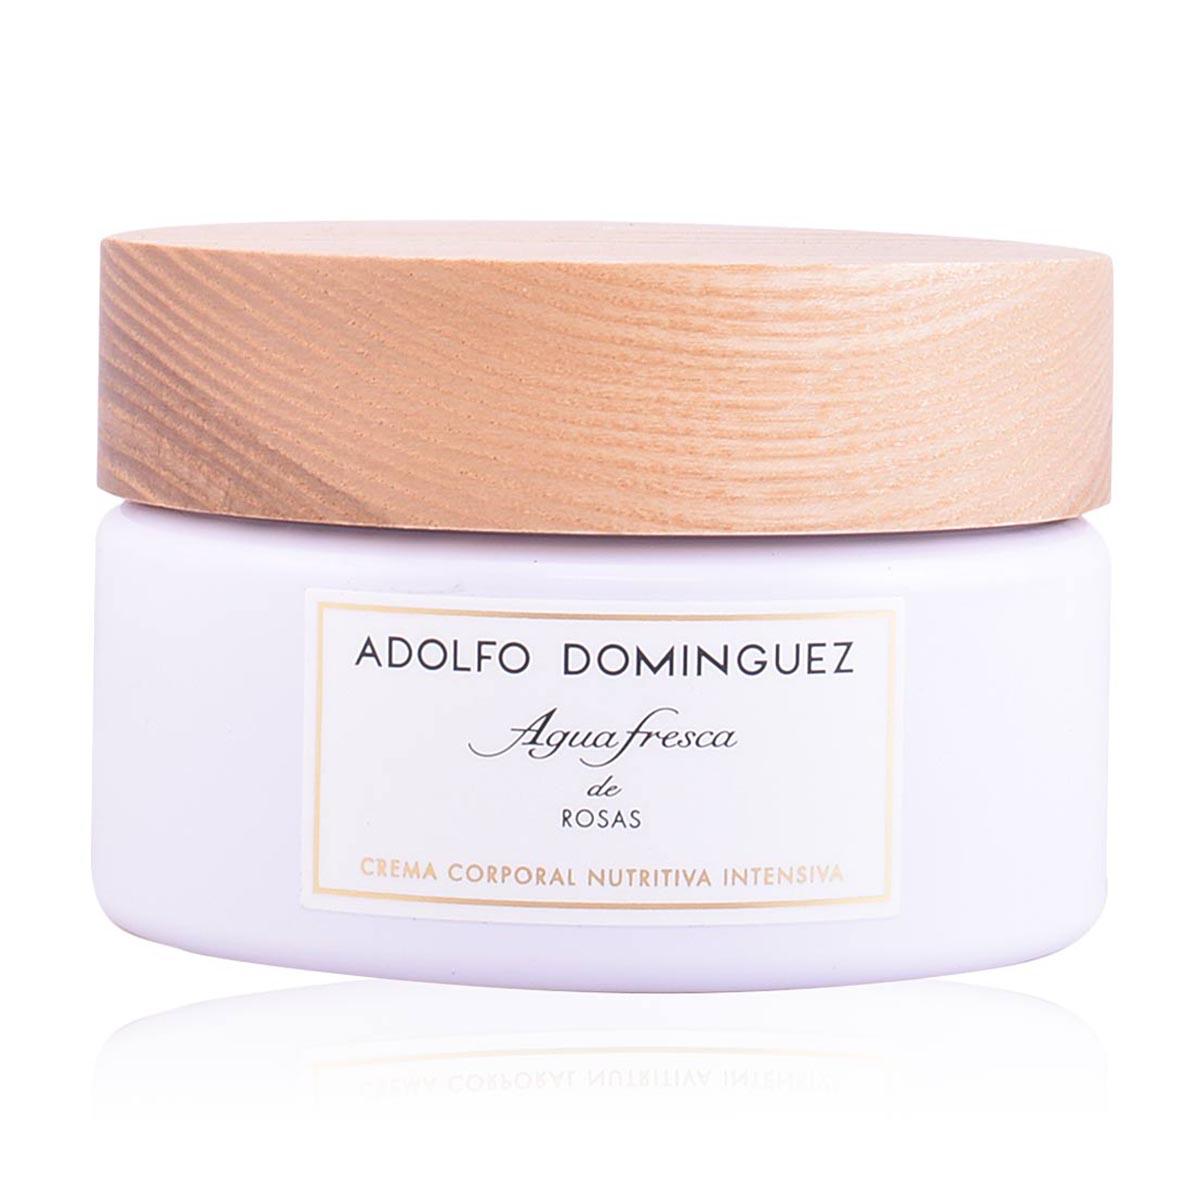 Adolfo dominguez agua fresca de rosas crema corporal nutritiva intensiva 300ml tarro tarro